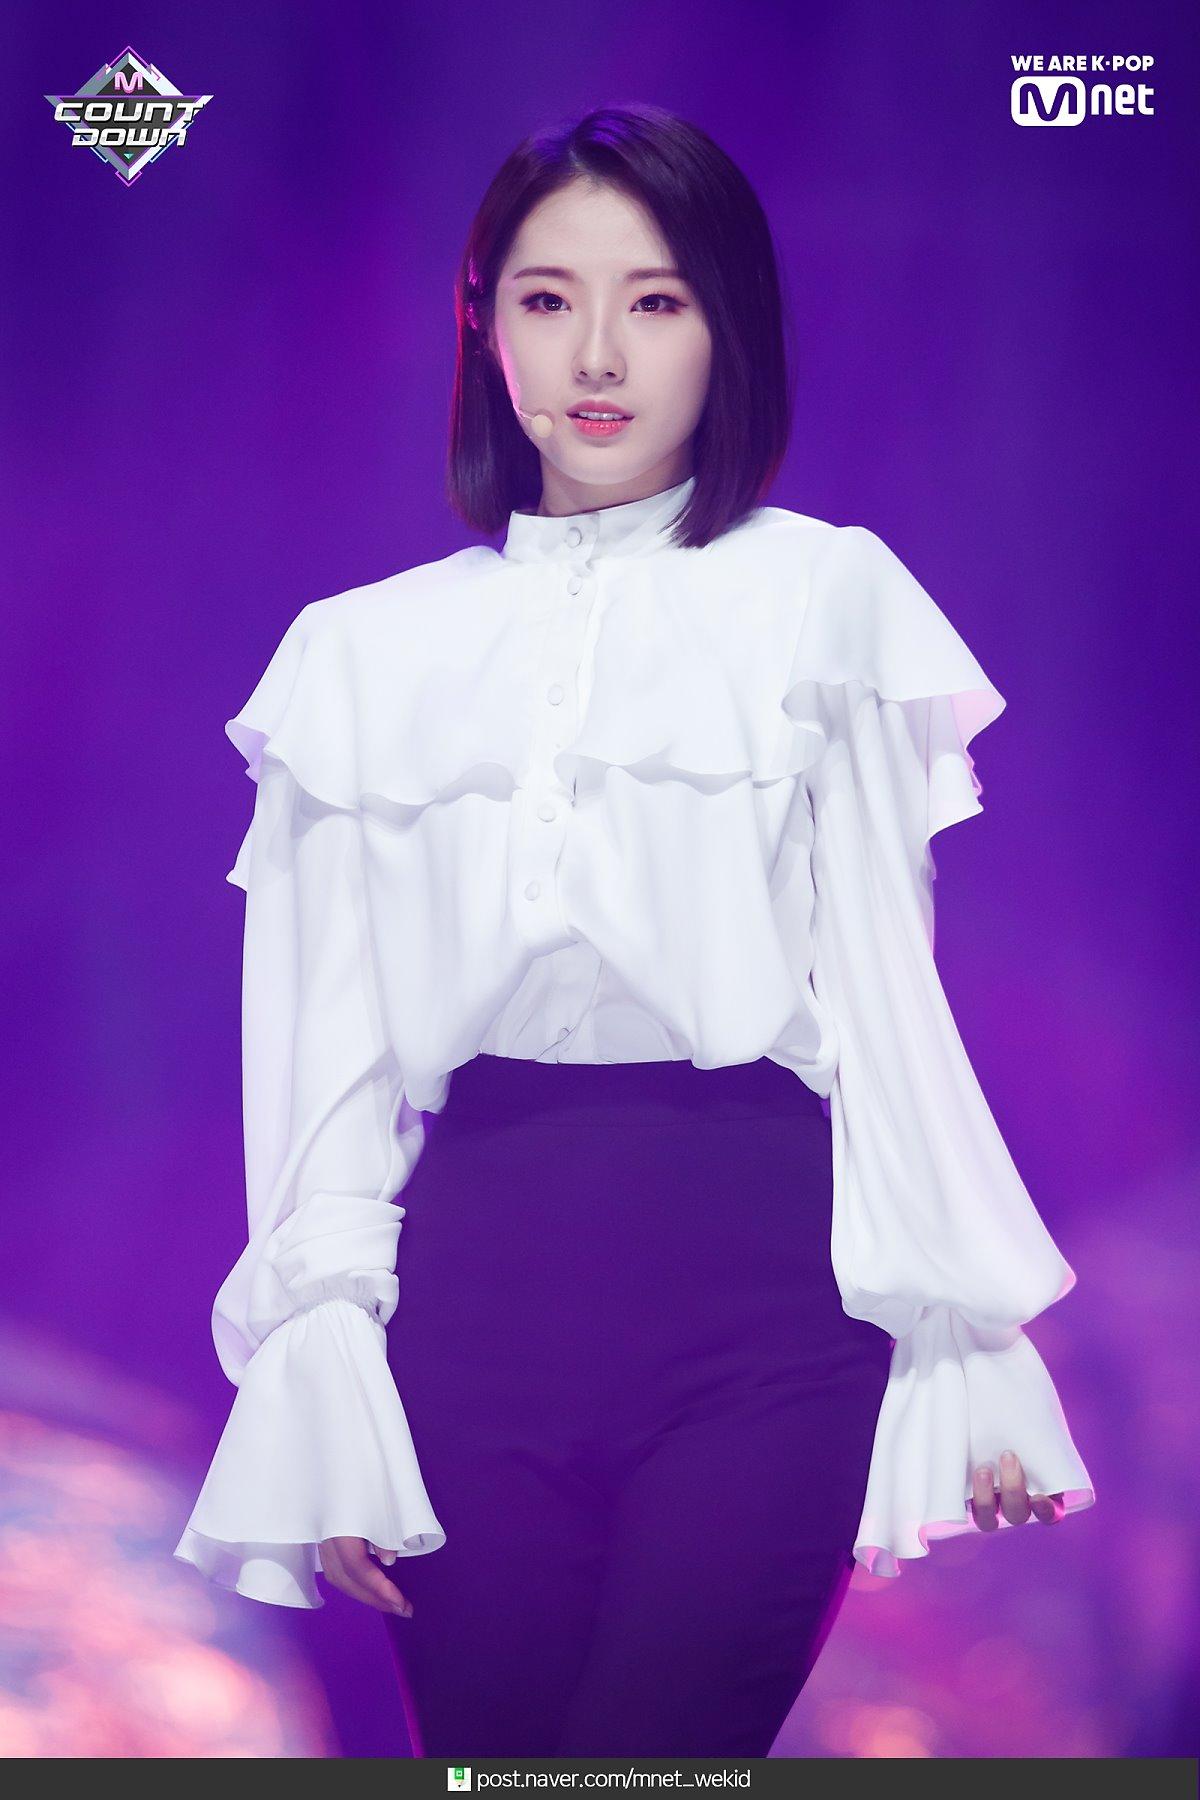 190221 Mcountdown Naver Butterfly HaSeul.jpg